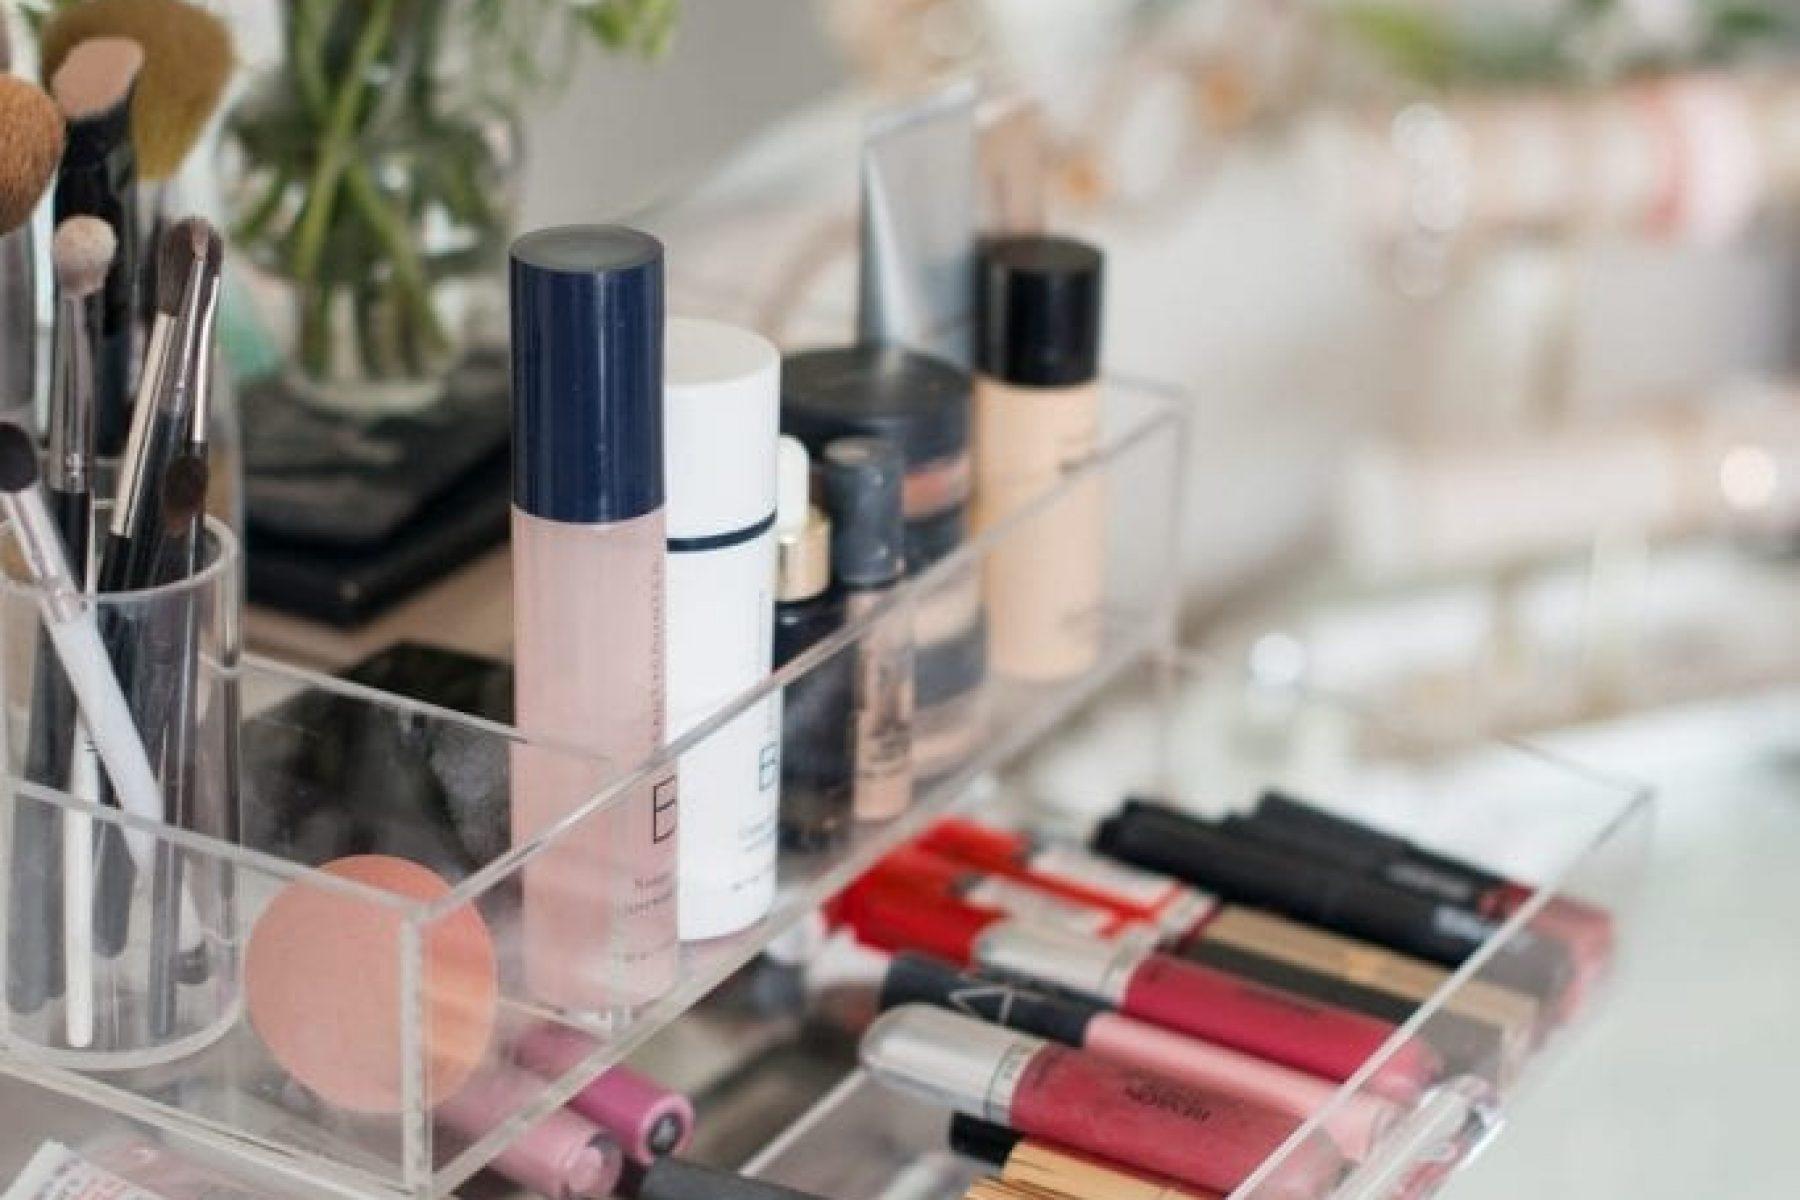 Spring Cleaning - Organizing - Spring- GLAMboxes - Make Up - Jo Malone-5